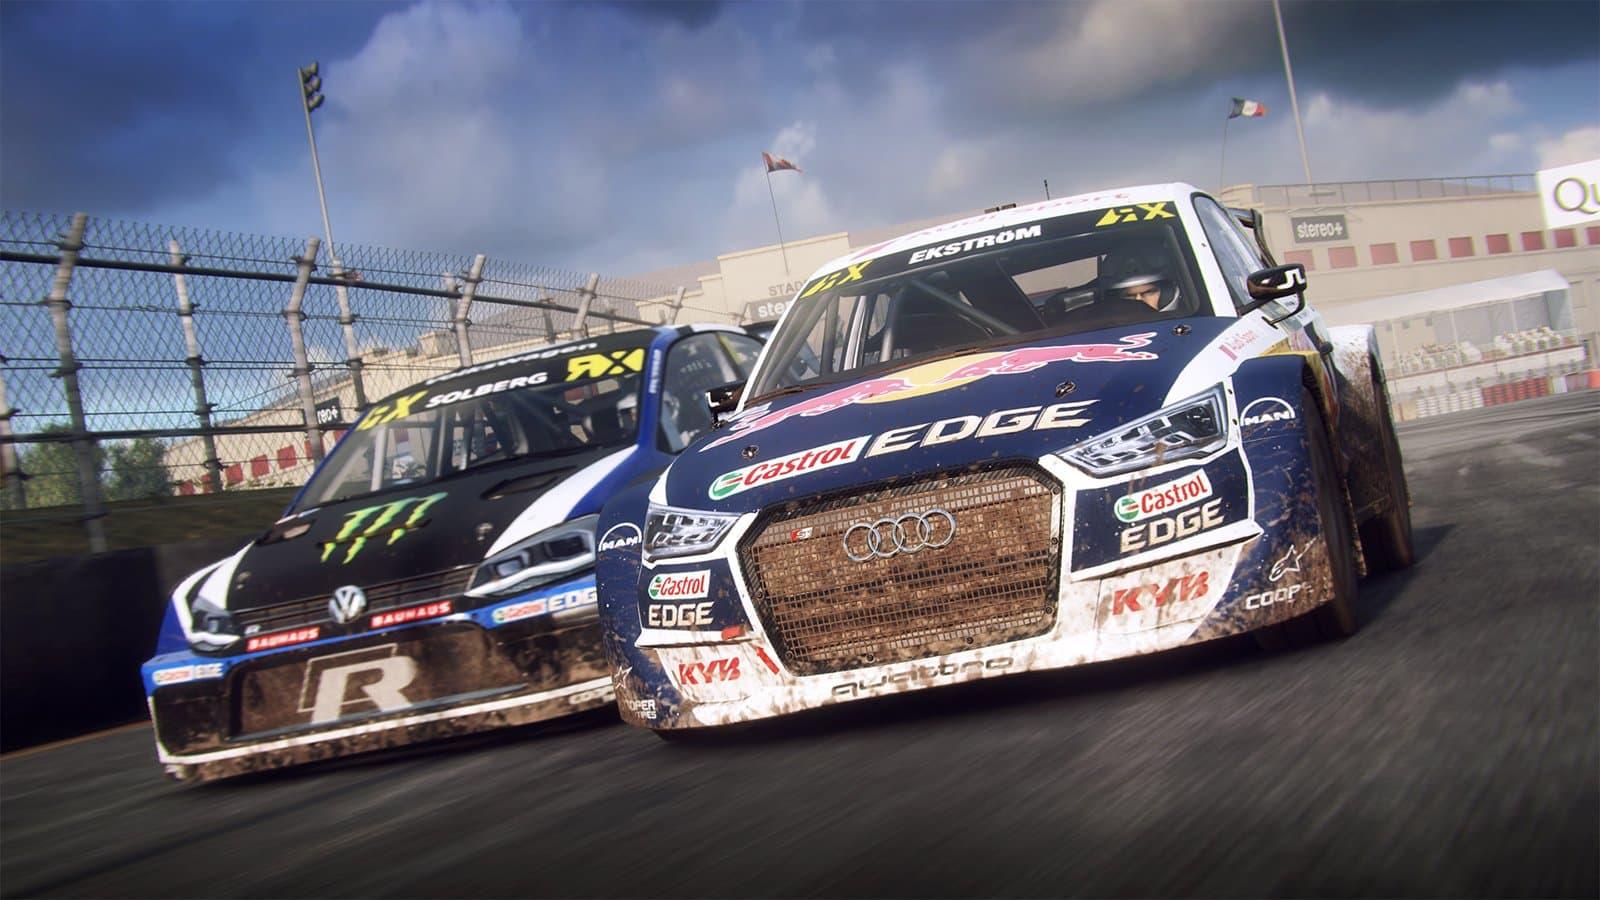 DiRT Rally 2.0 Xbox